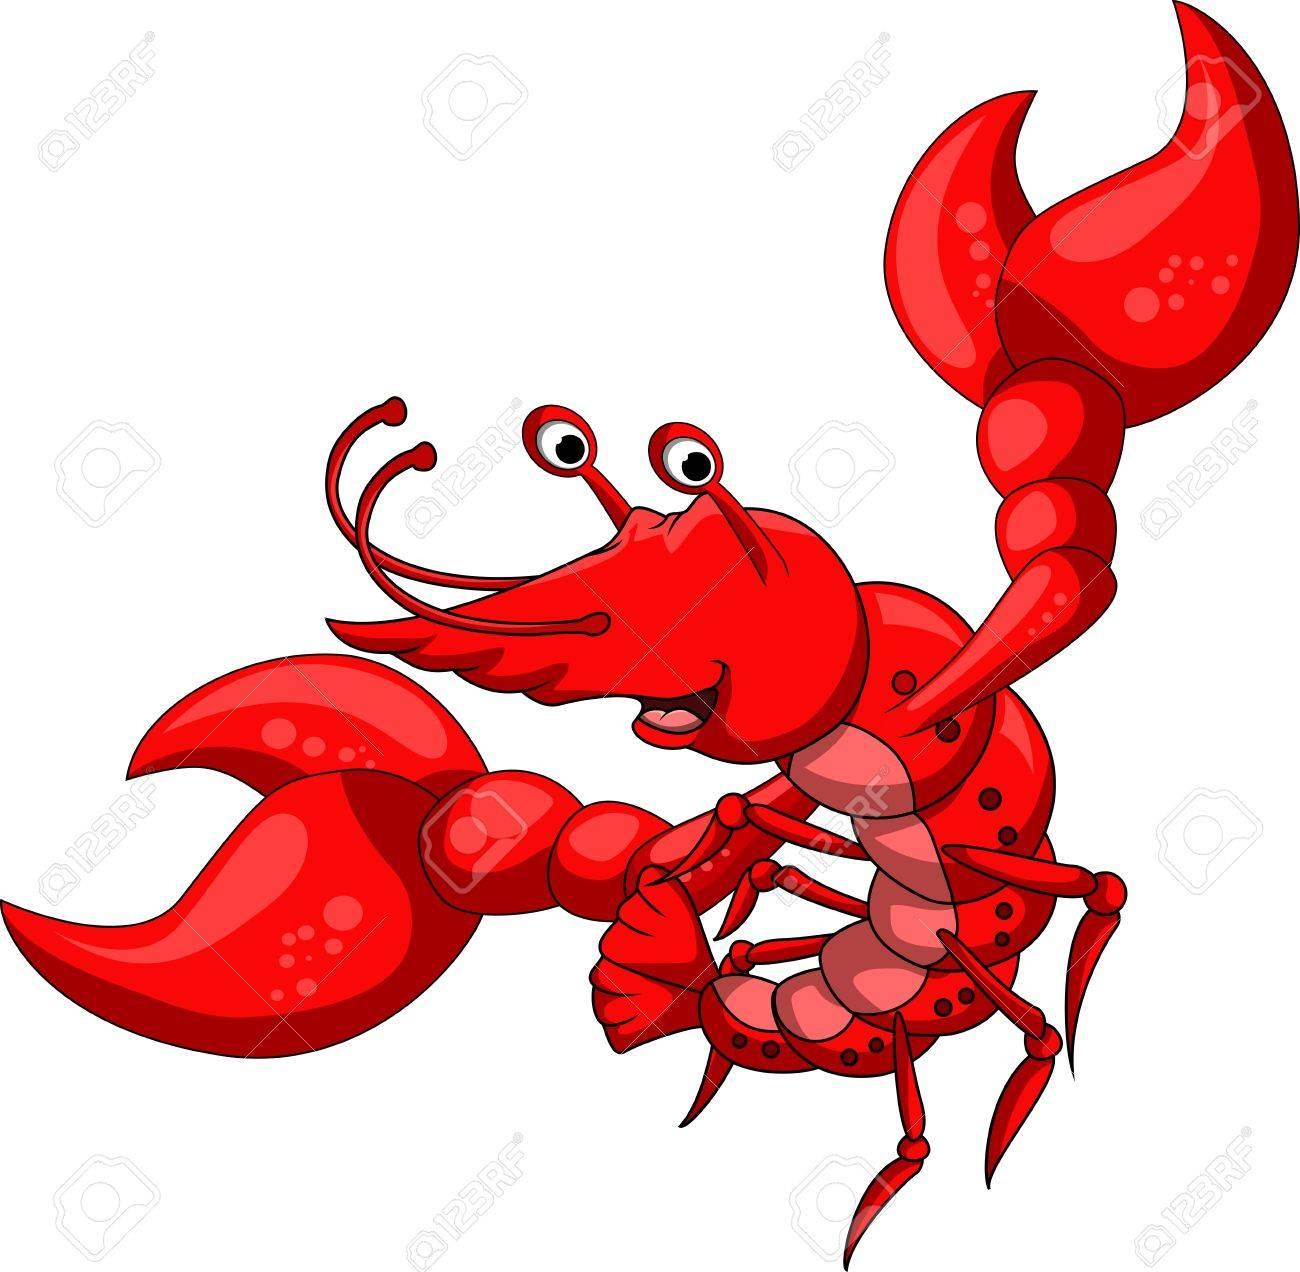 1300x1272 Images Jumbo Shrimp Cartoon